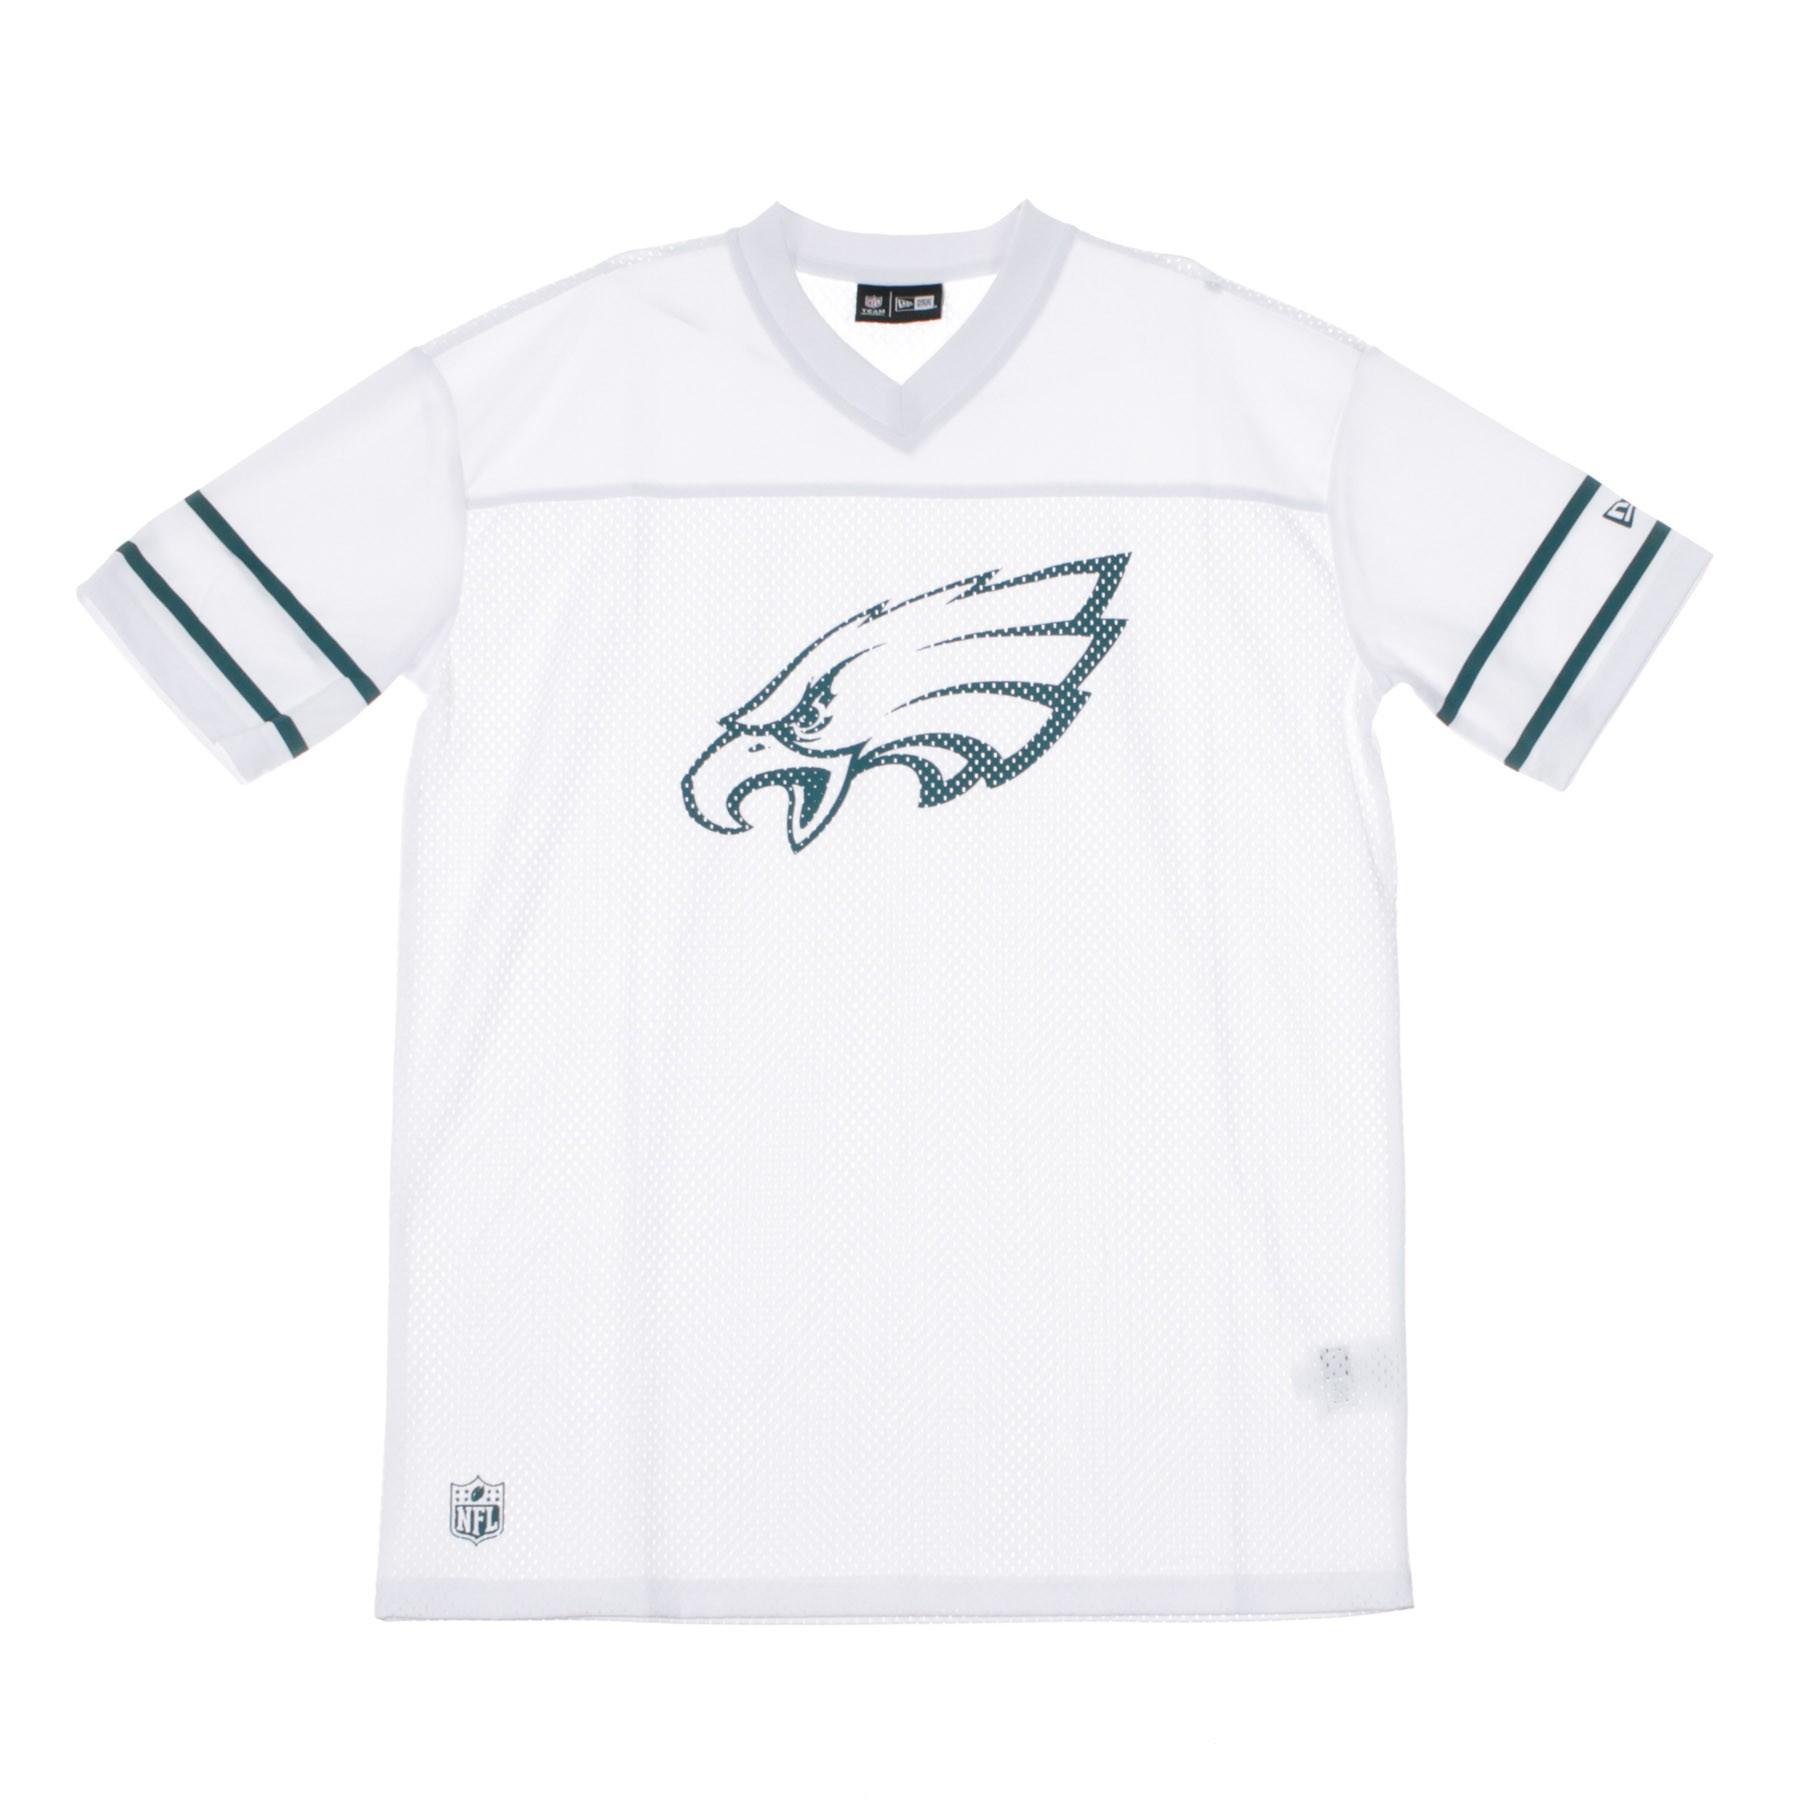 NEW Era NFL MAGLIA JERSEY SHIRT-Philadelphia Eagles